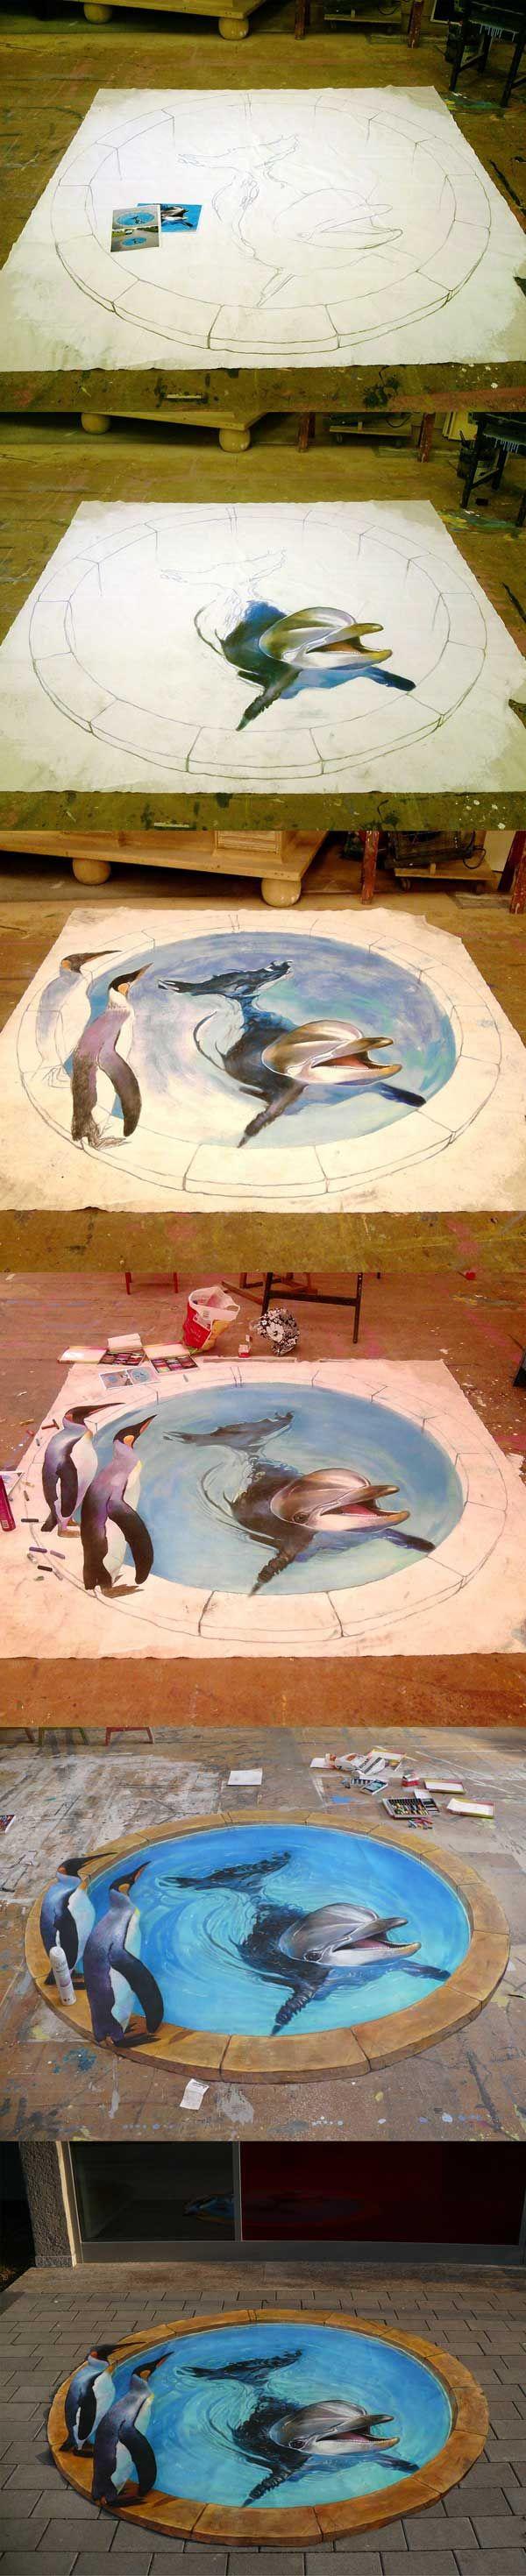 Step by step 3d Street Art Painting Tutorial 25+ New Cool & Creative 3D Street Art Paintings 2012